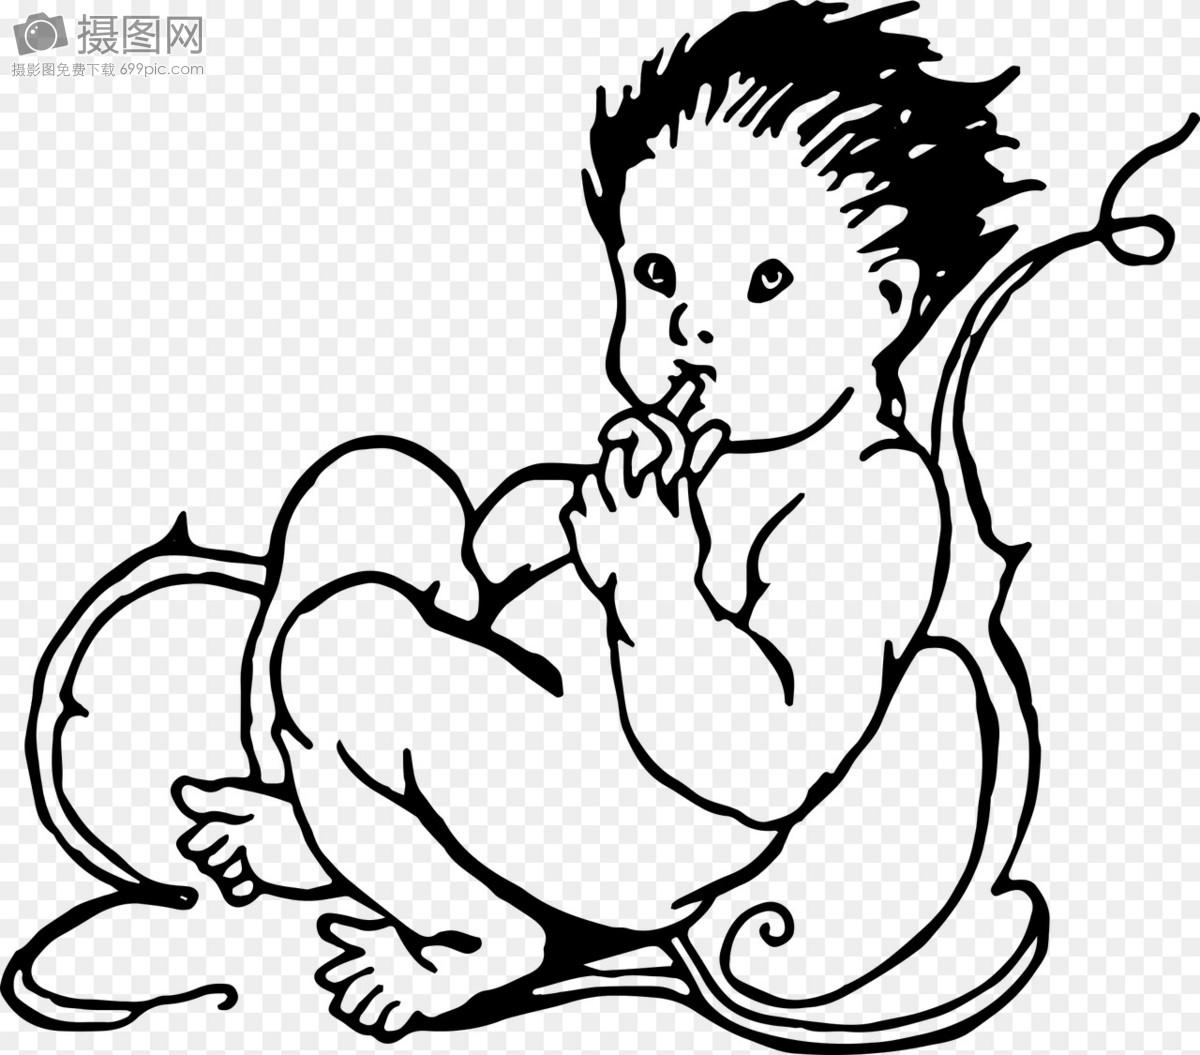 Buat Sketsa Bayi Gambar Unduh Gratis Foto 400050072format Gambar